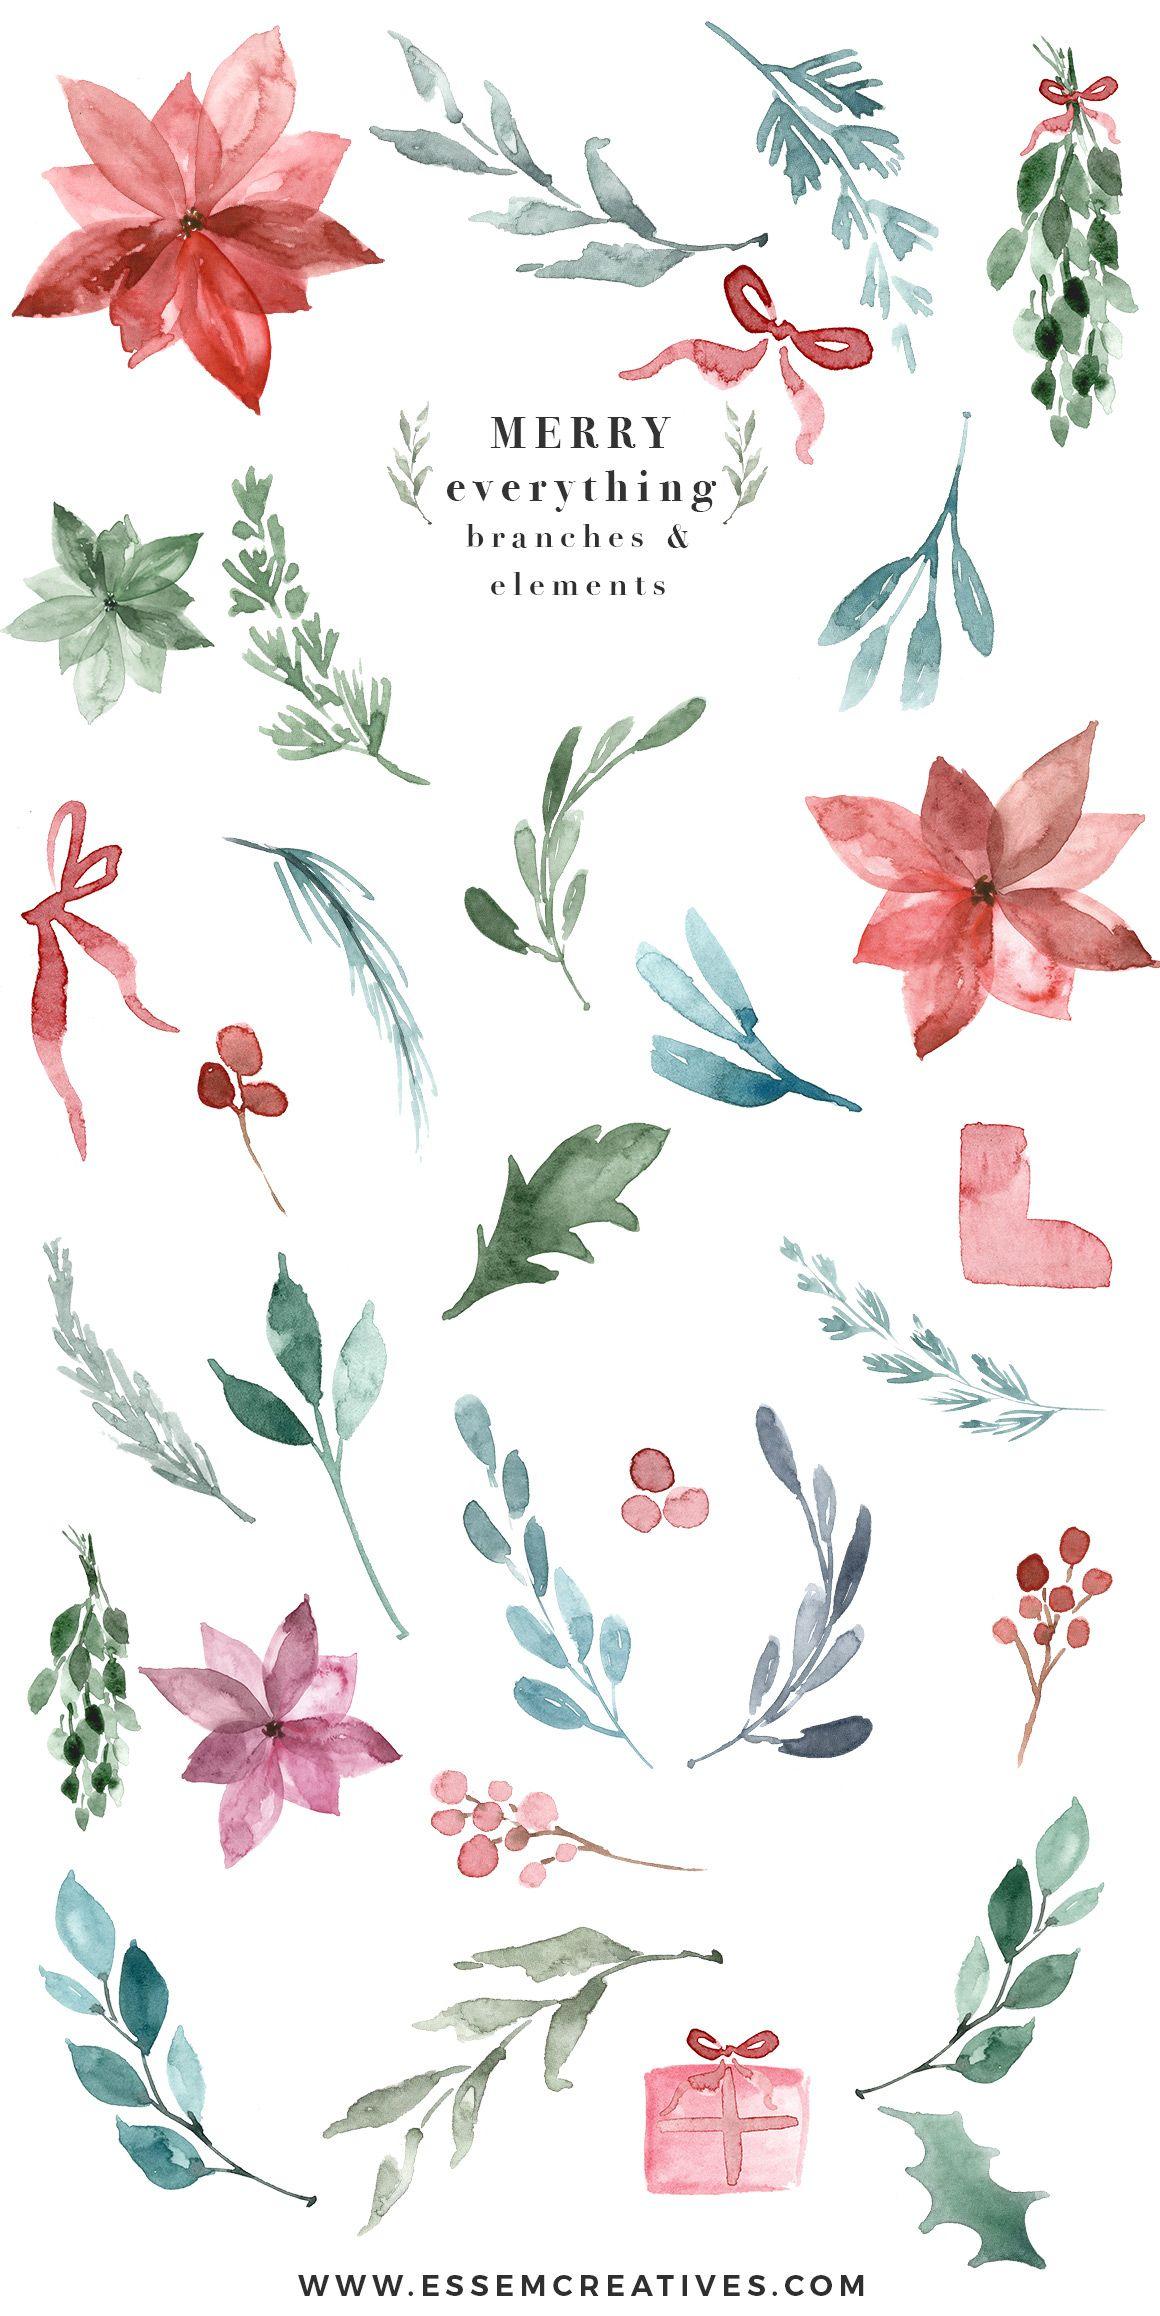 Photo of Watercolor Christmas card template, Christmas wreath clipart, mistletoe